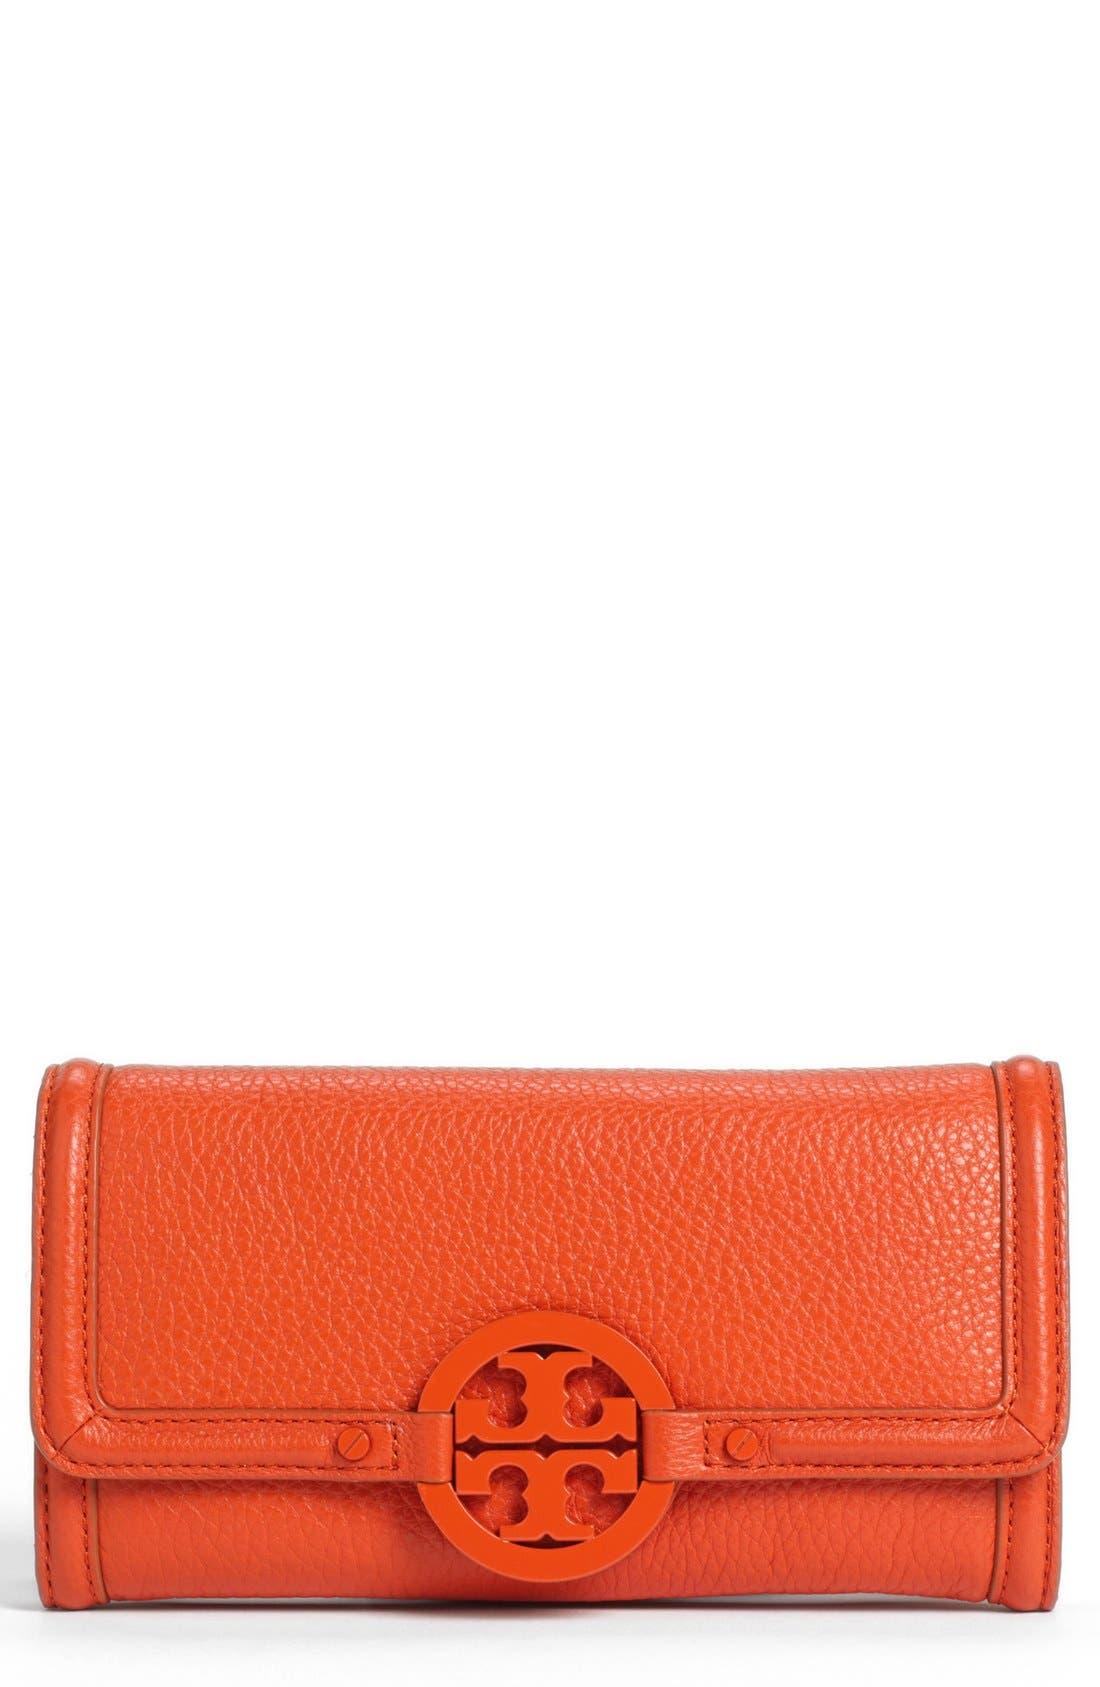 Main Image - Tory Burch 'Amanda' Continental Envelope Wallet